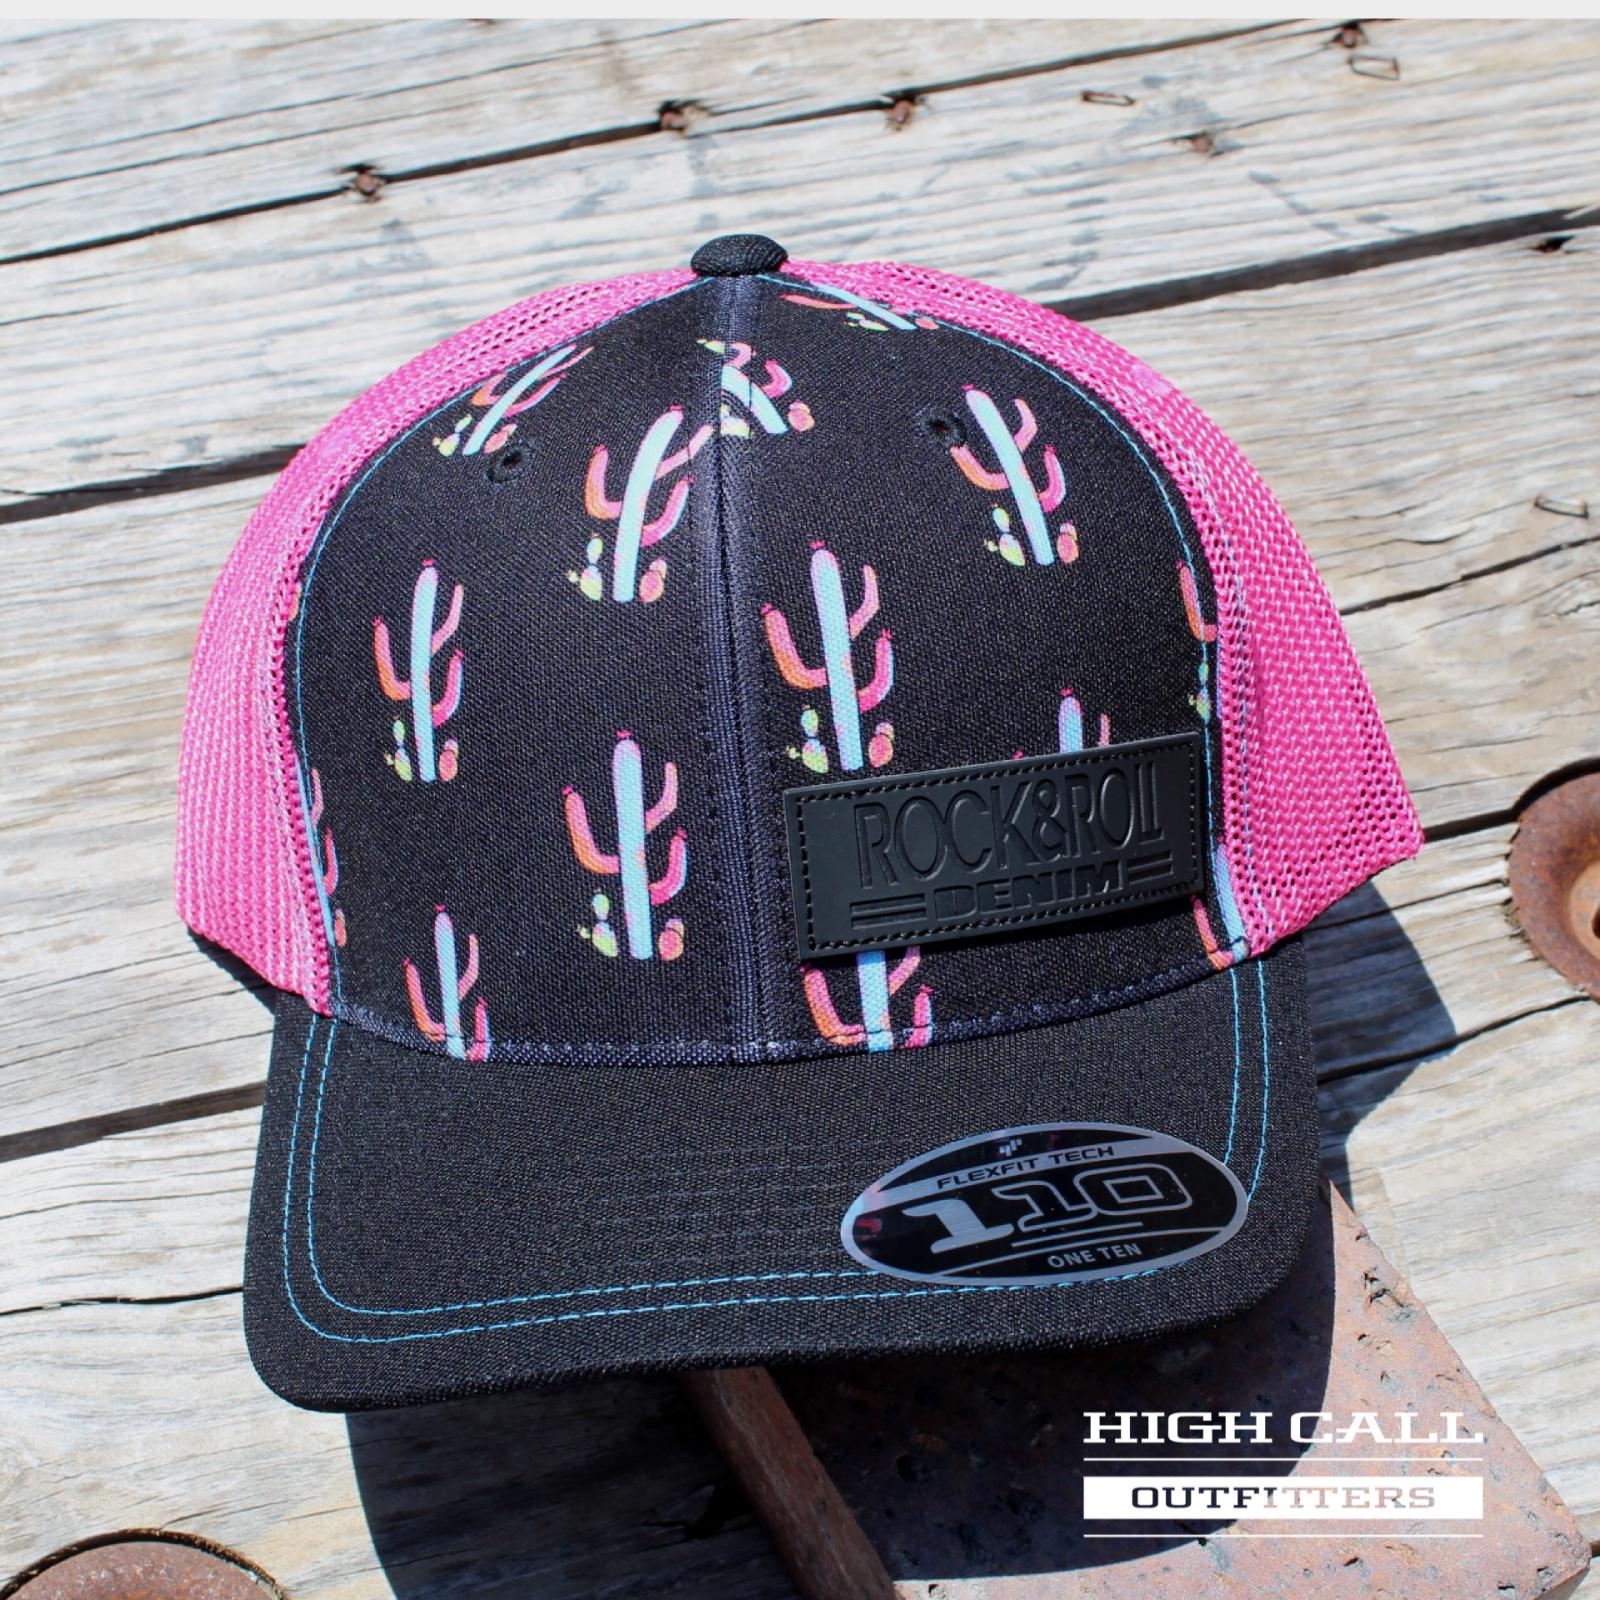 Cactus Ballcap from Rock & Roll